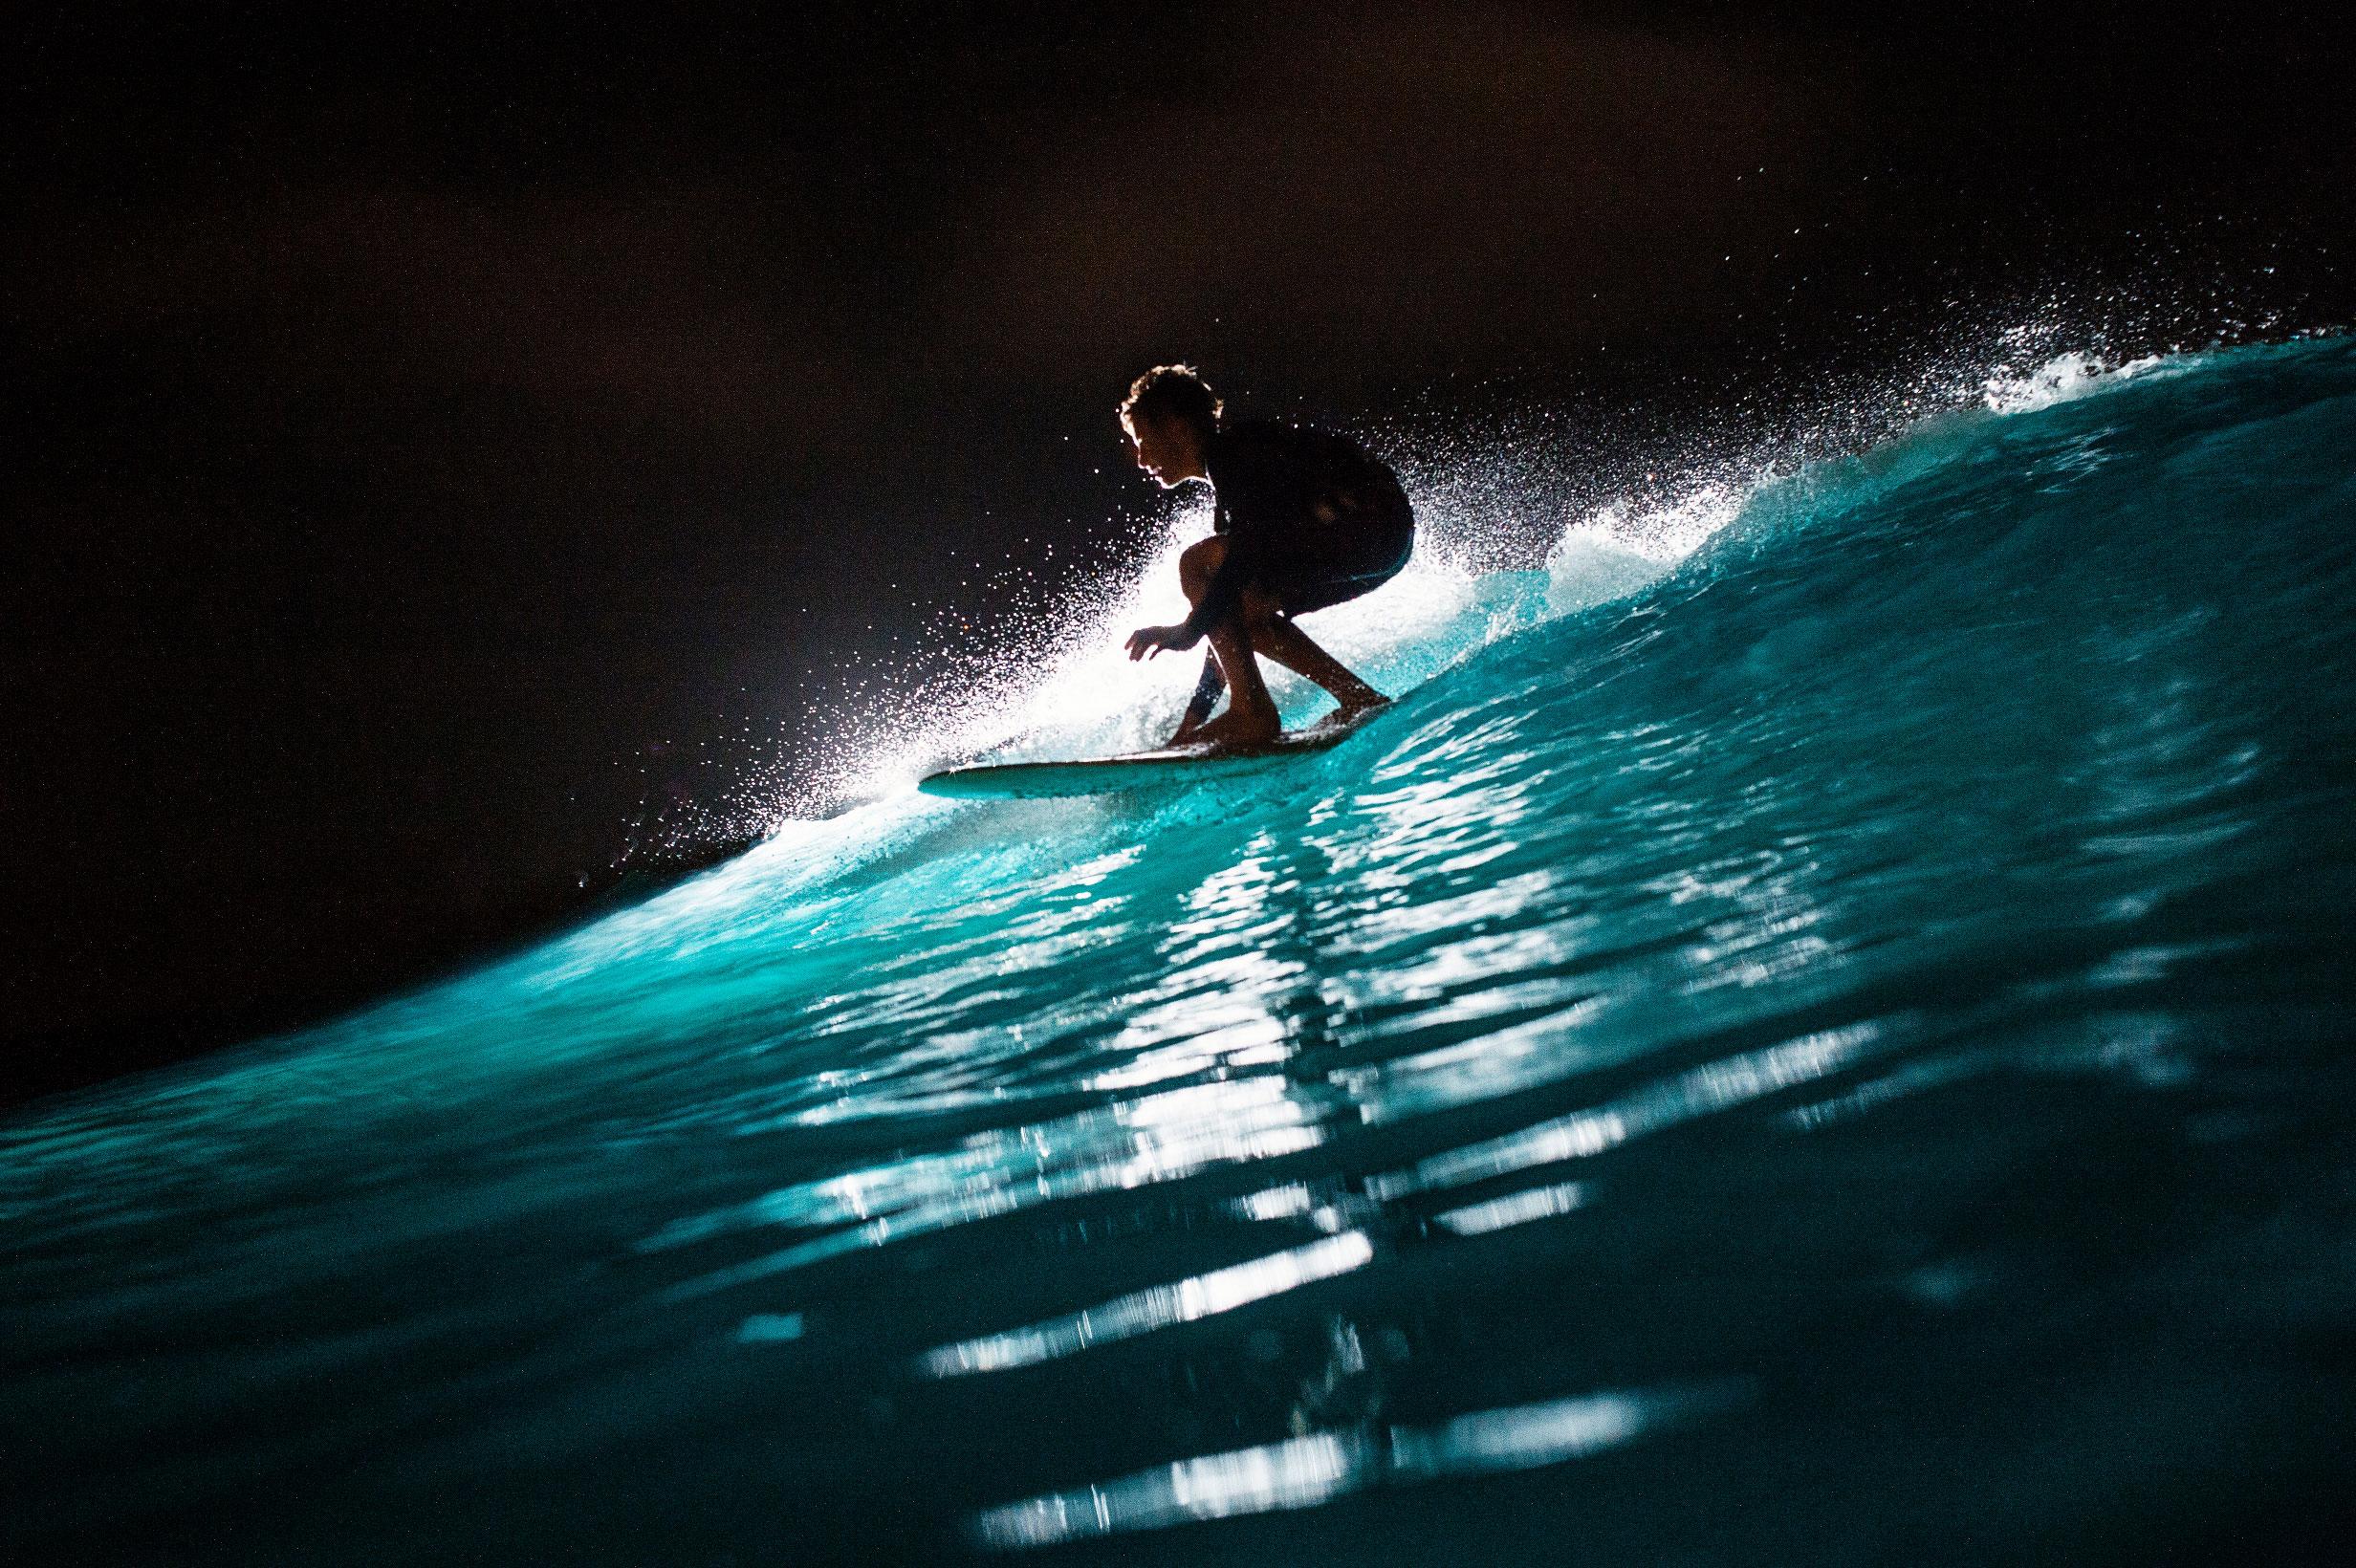 night_surfing_waikiki0008 Small.jpg